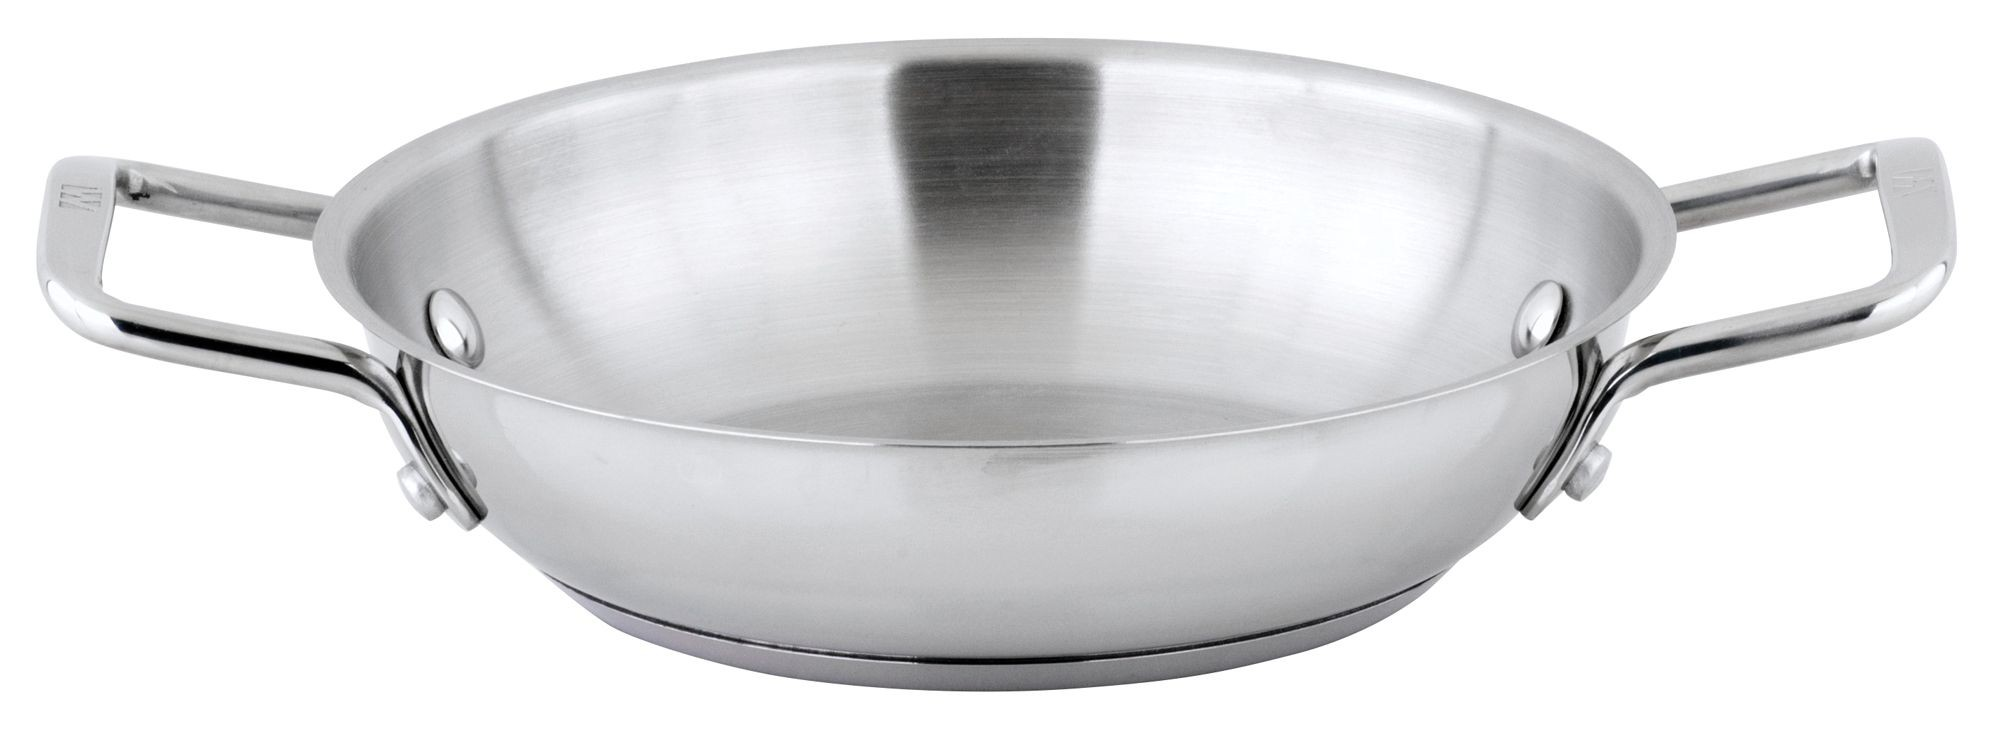 "Winco SSOP-8 Stainless Steel 8"" Omelet Pan"